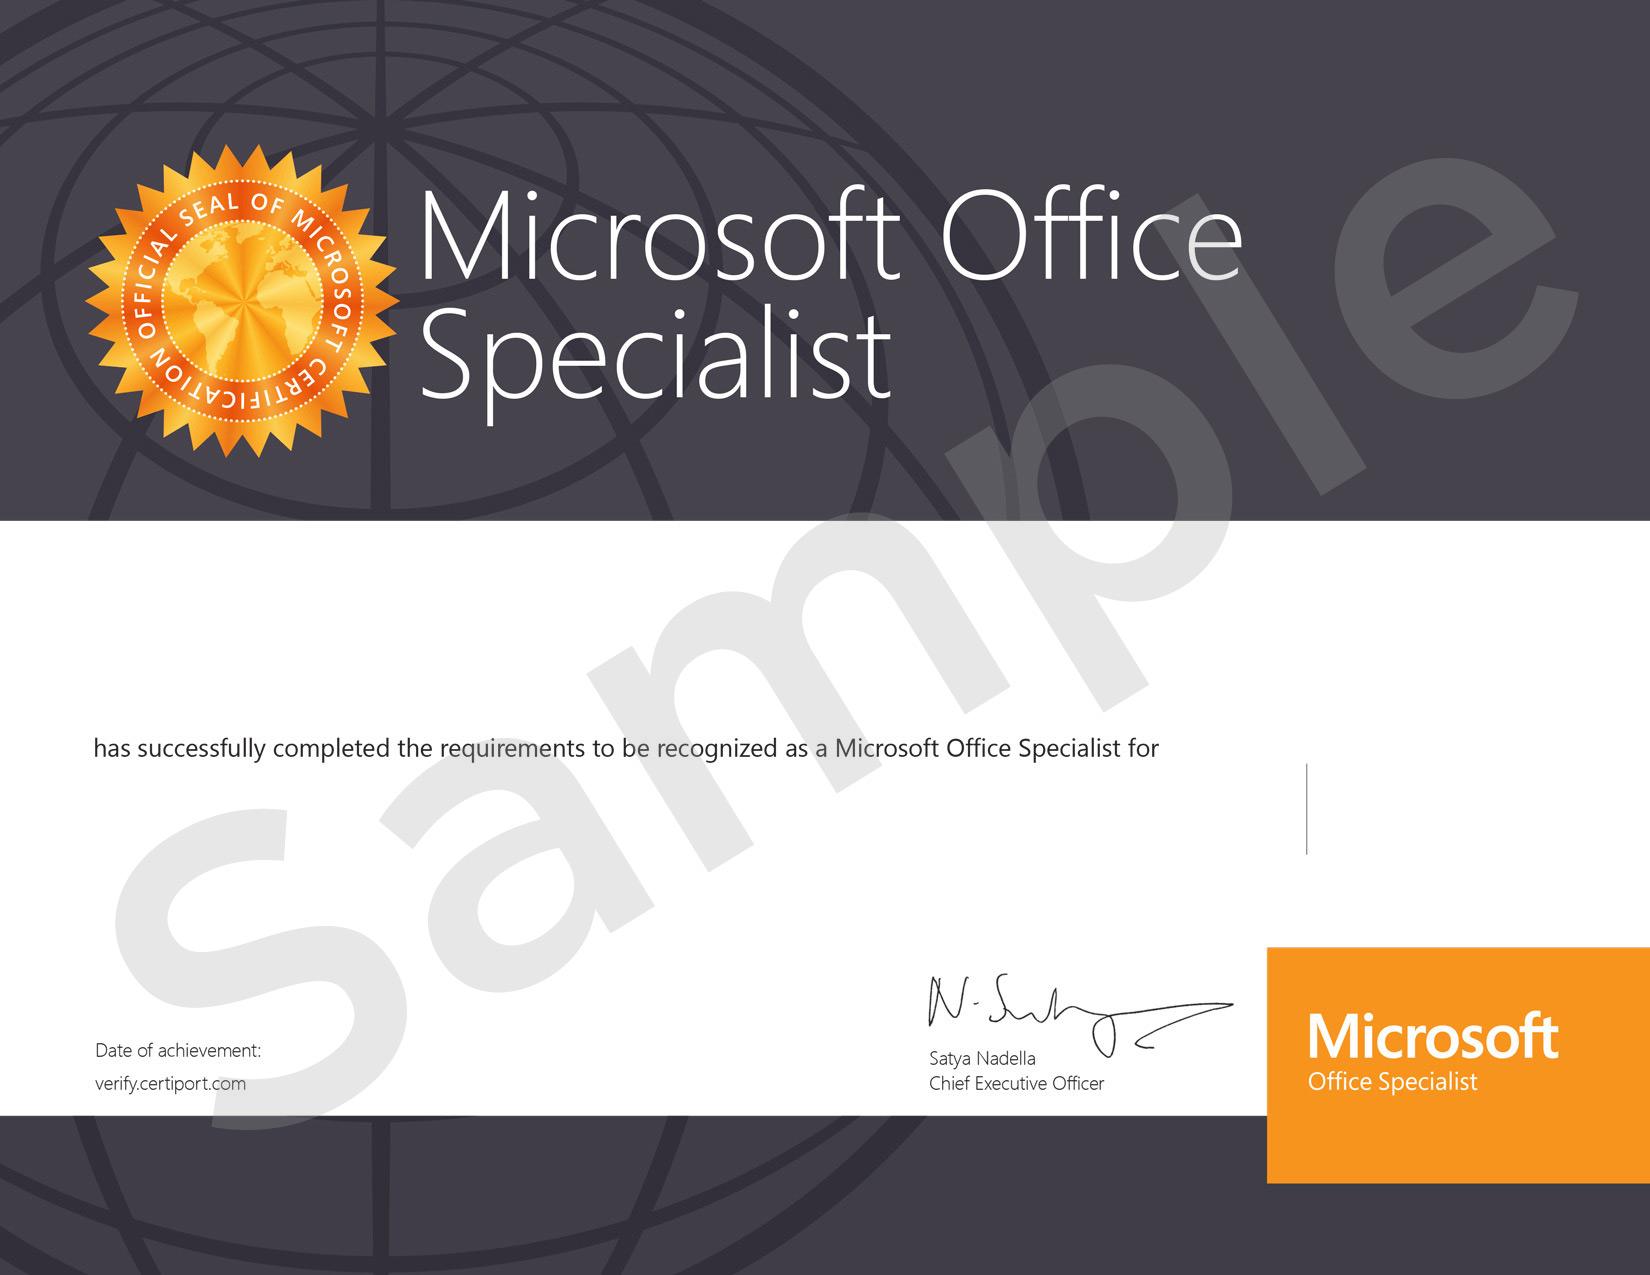 Centro examinador Microsoft Office Specialist